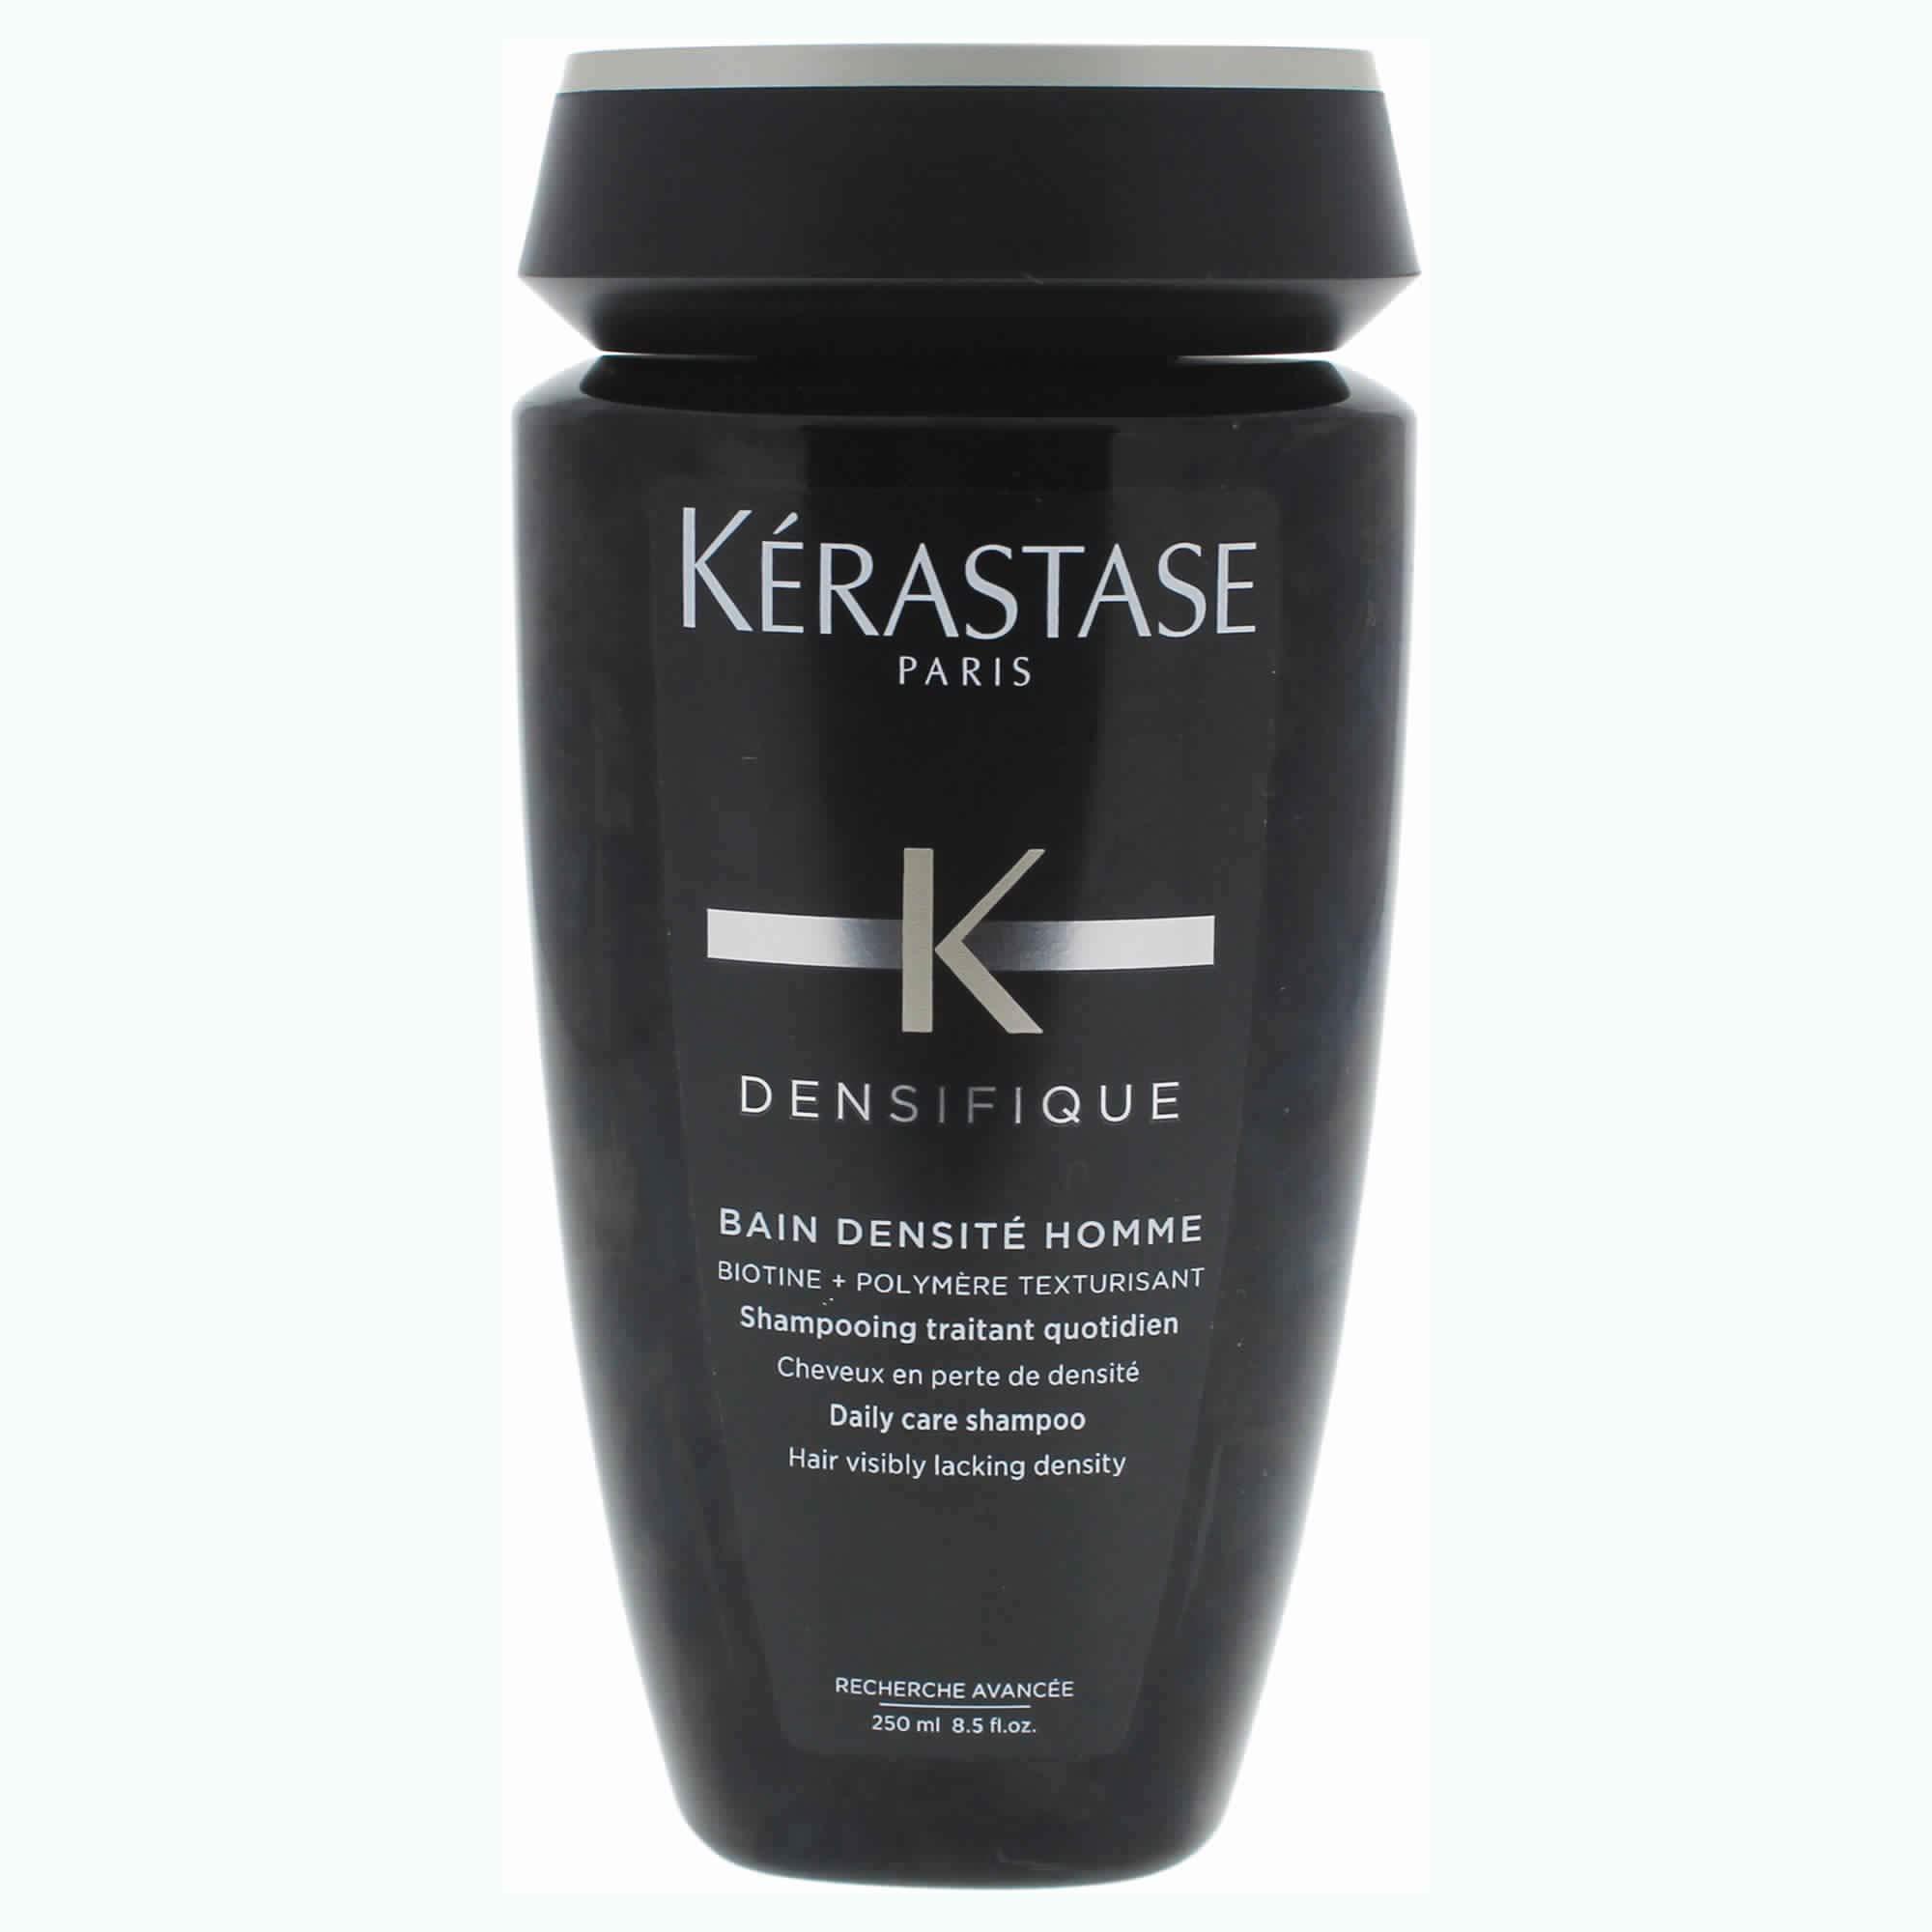 KERASTASE, Densifique Bain Densite Homme Daily Care Shampoo Ounce, Fresh, 8.5 Fl Oz